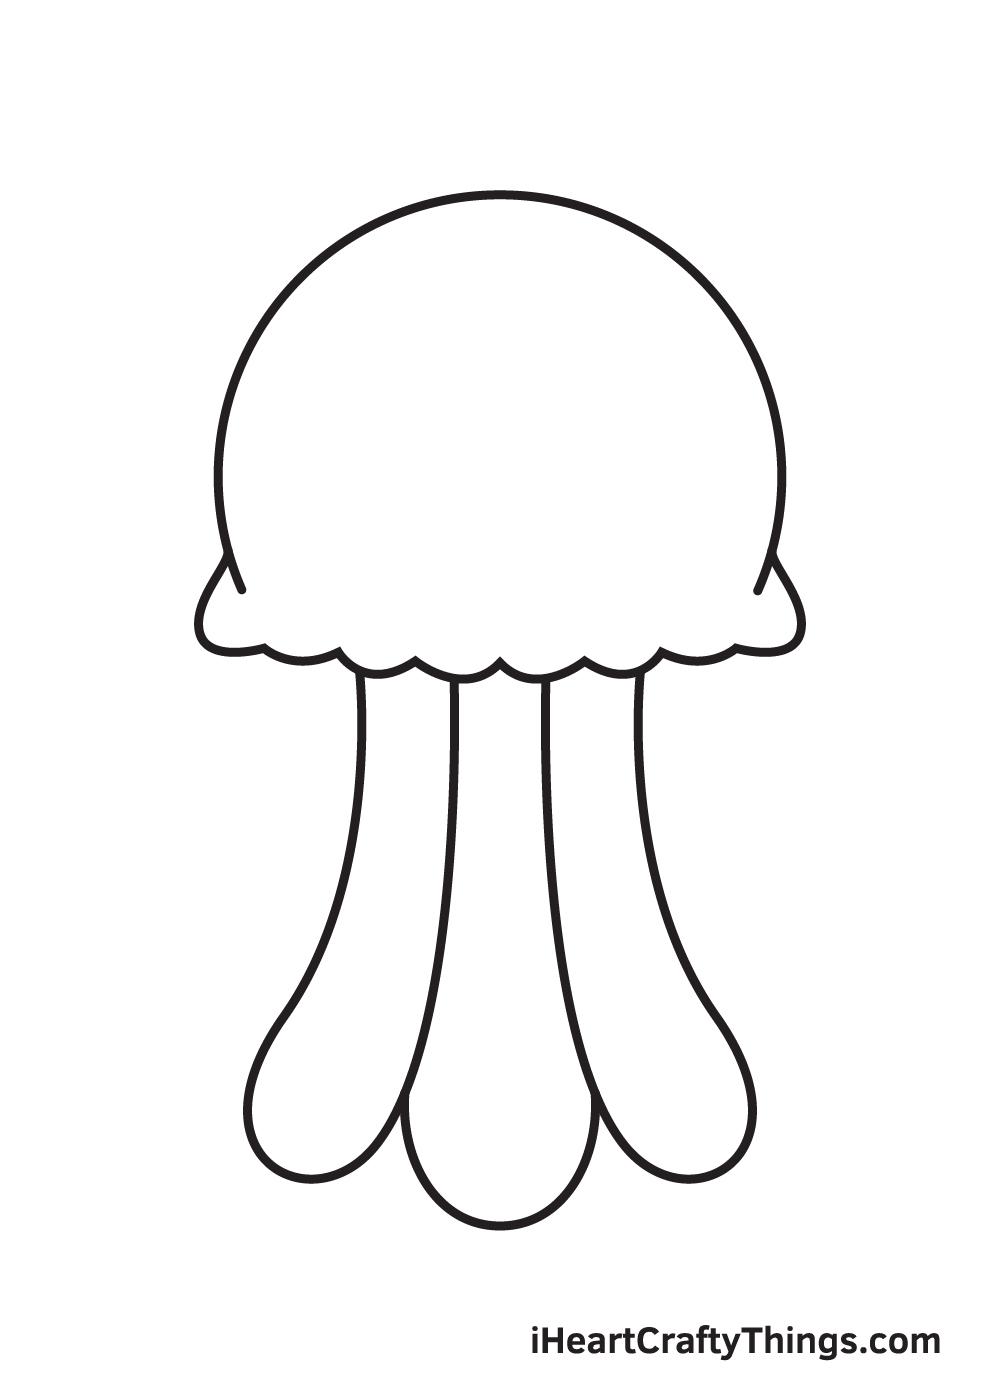 jellyfish drawing step 5